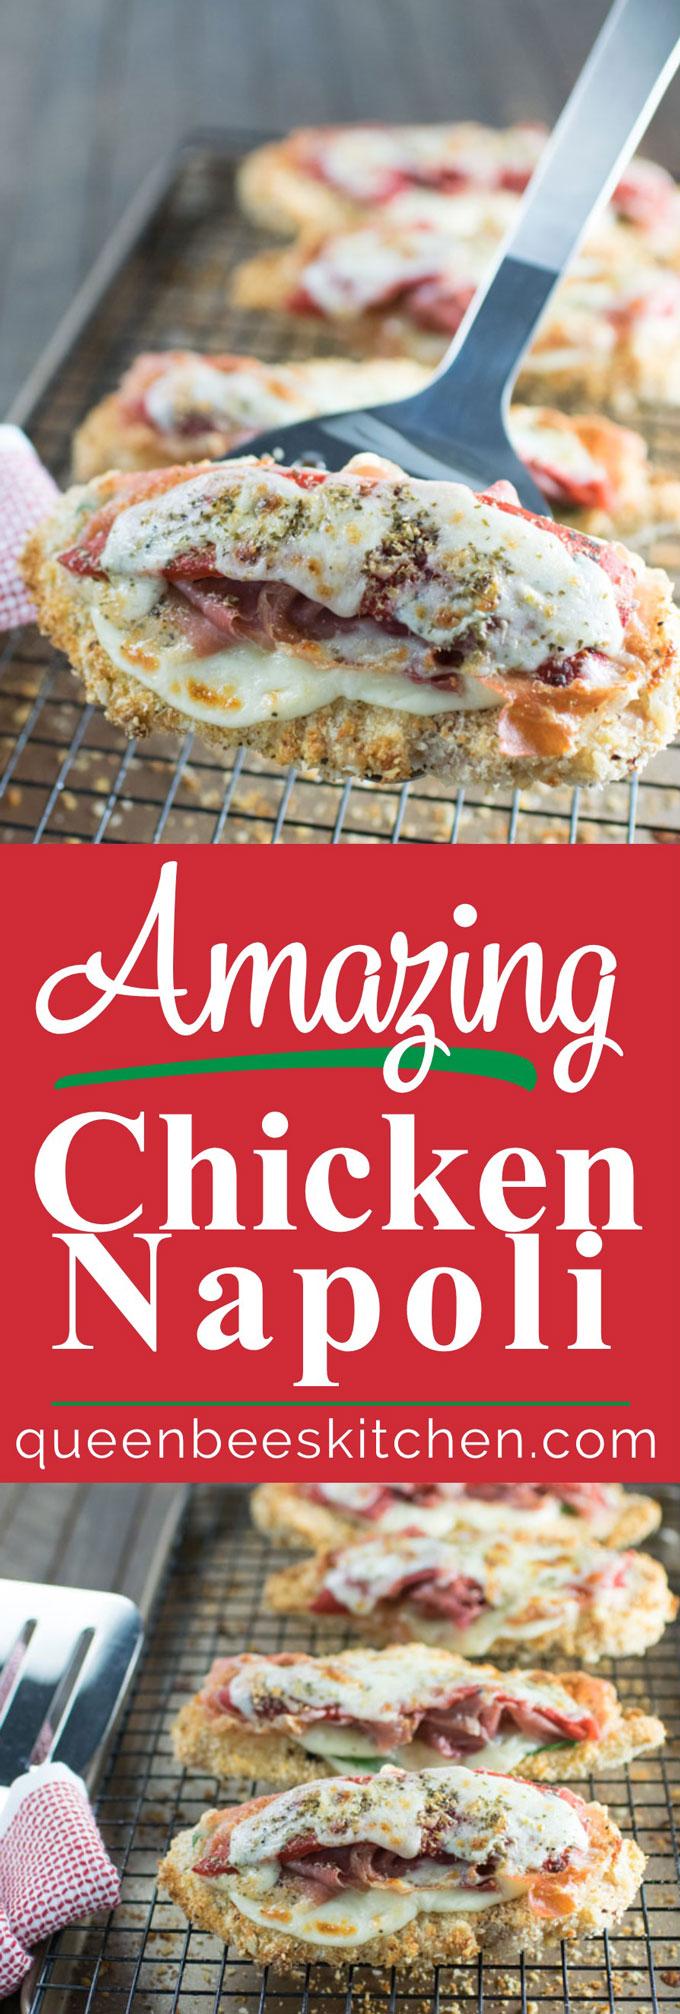 Chicken Napoli